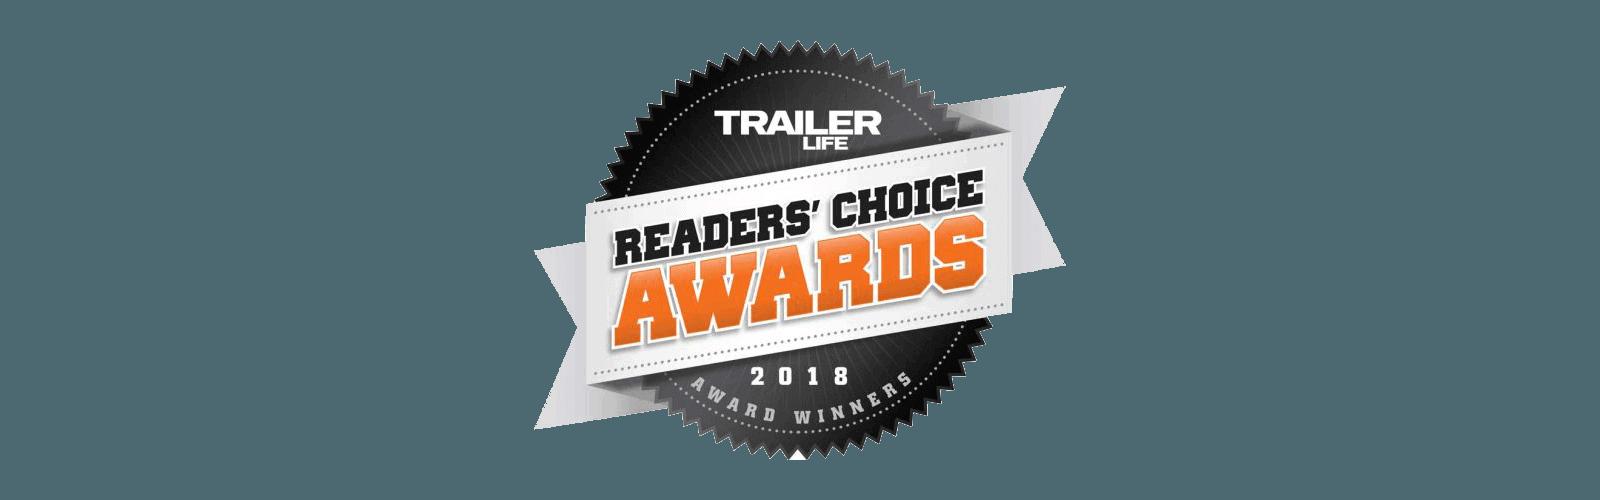 Trailer Life Readers' Choice Award